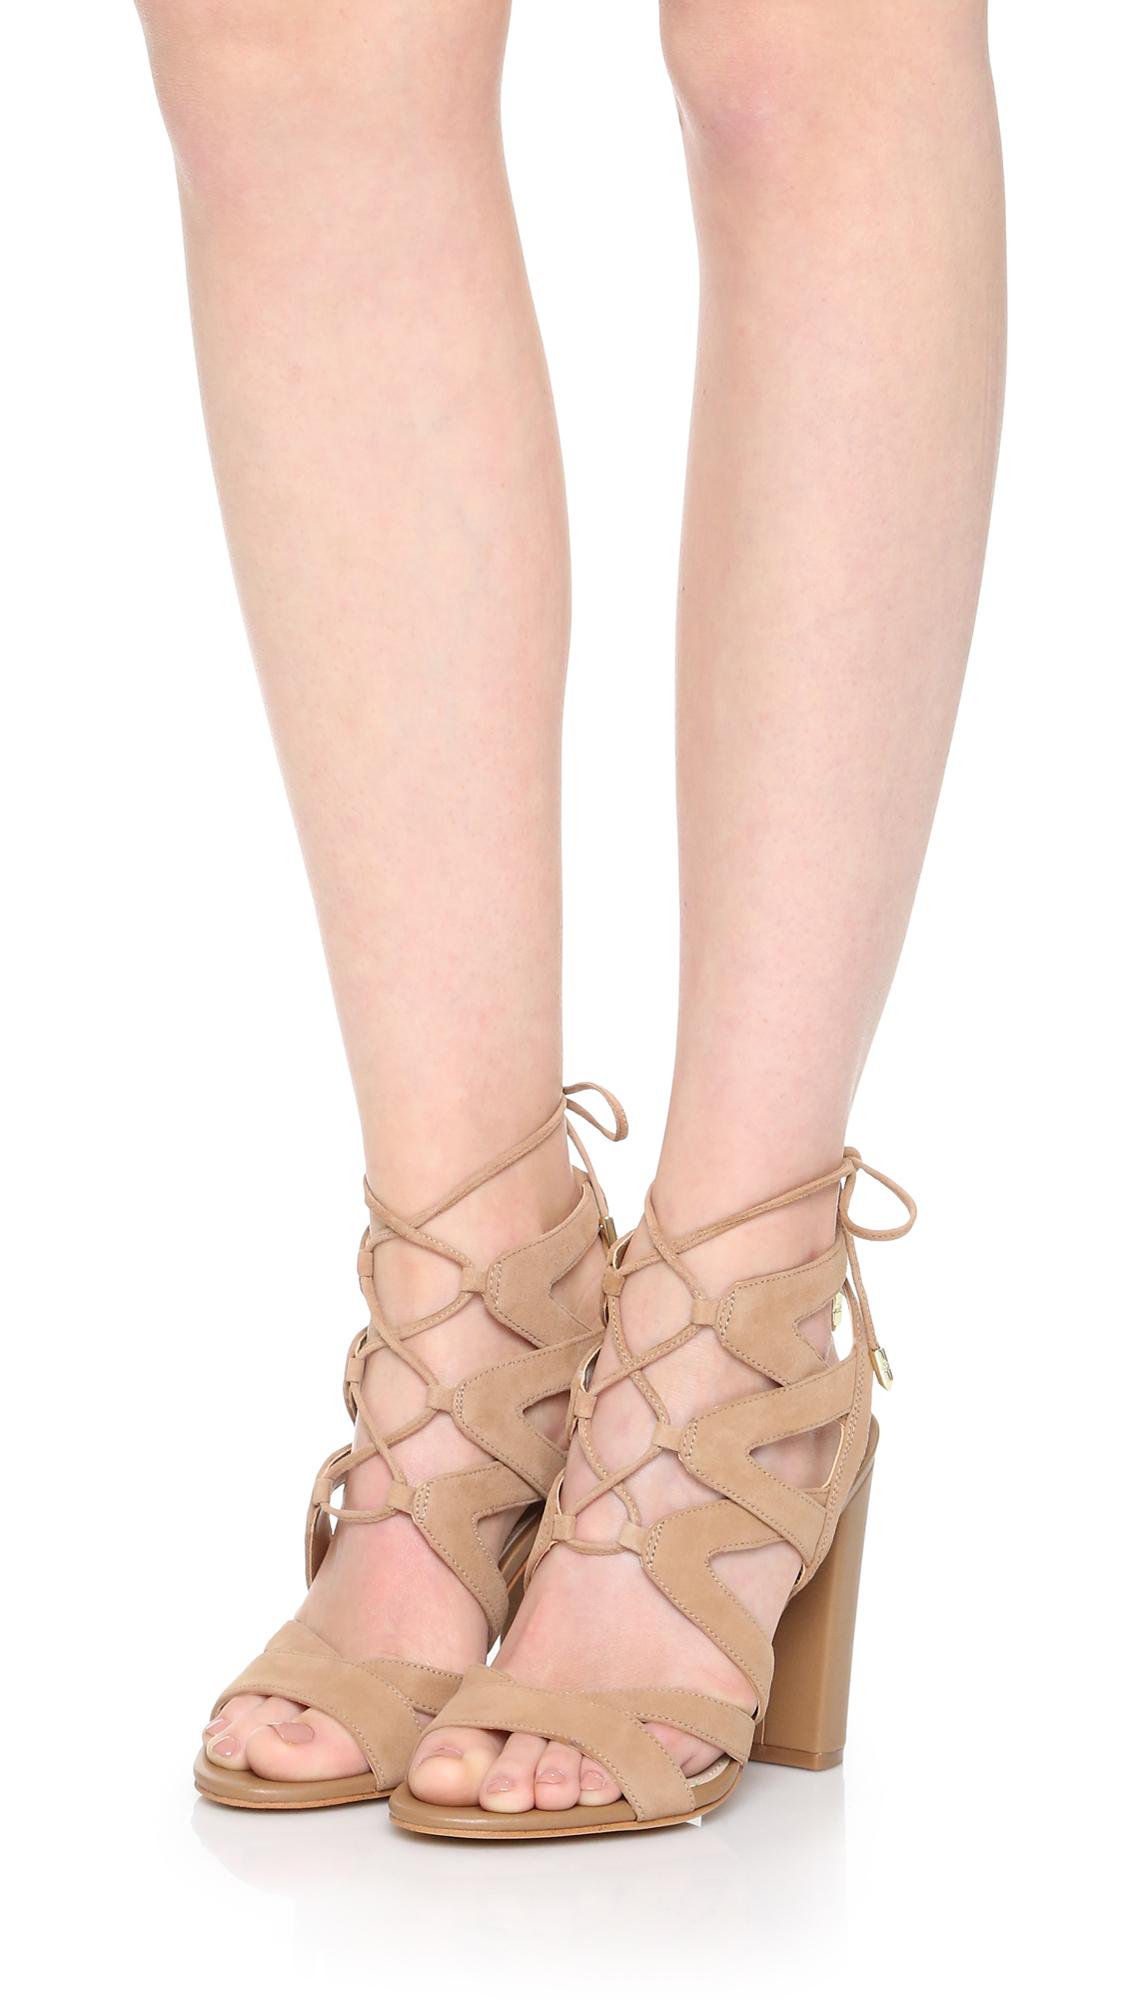 cec706548b6f Sam Edelman Yardley Lace Up Sandals